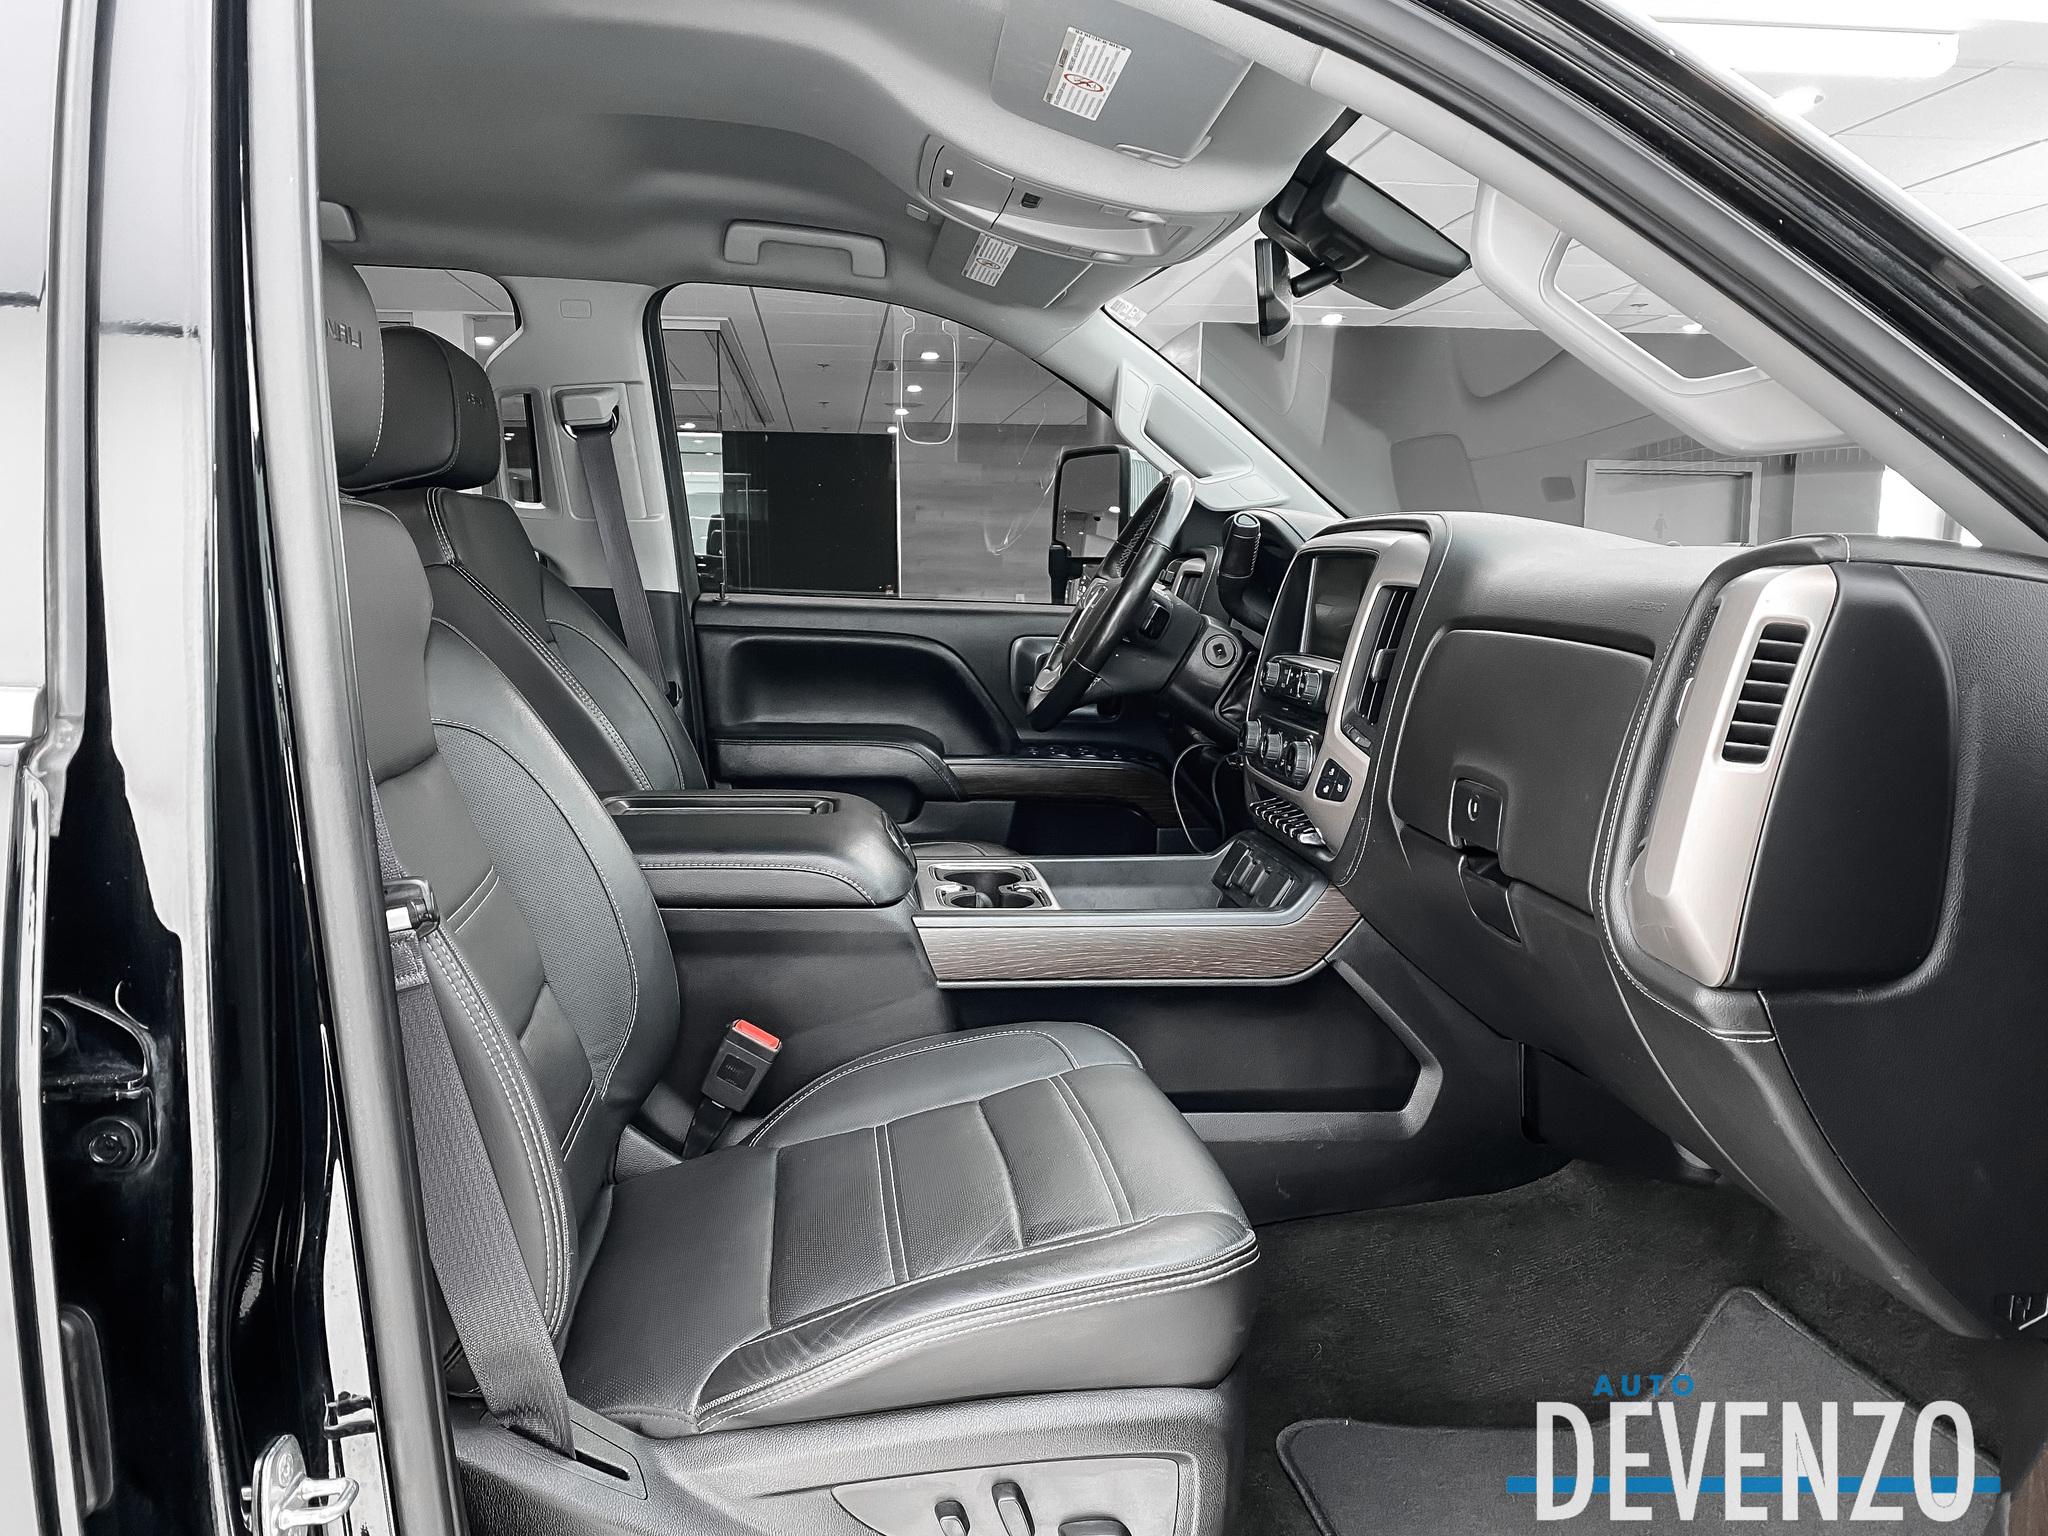 2017 GMC SIERRA 2500HD 4WD Crew Cab DENALI Duramax Diesel Lift Kit 6»' complet